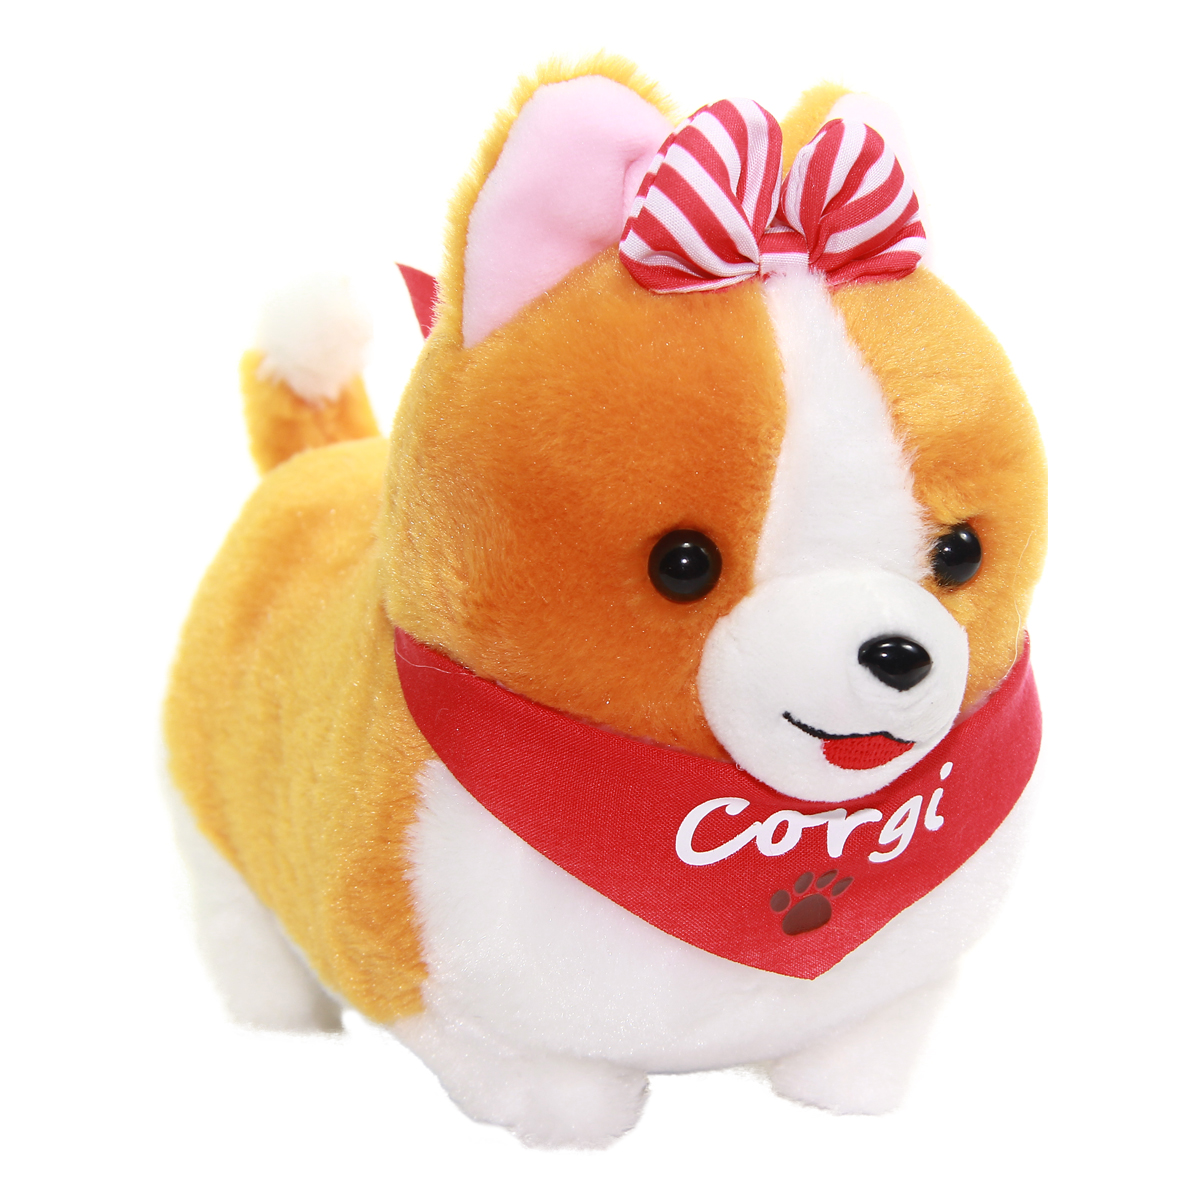 Amuse Ichi Ni no Corgi With Scarf Plush Collection Small Dog Plush Red Scarf Hana-chan Standard Size 6 Inches